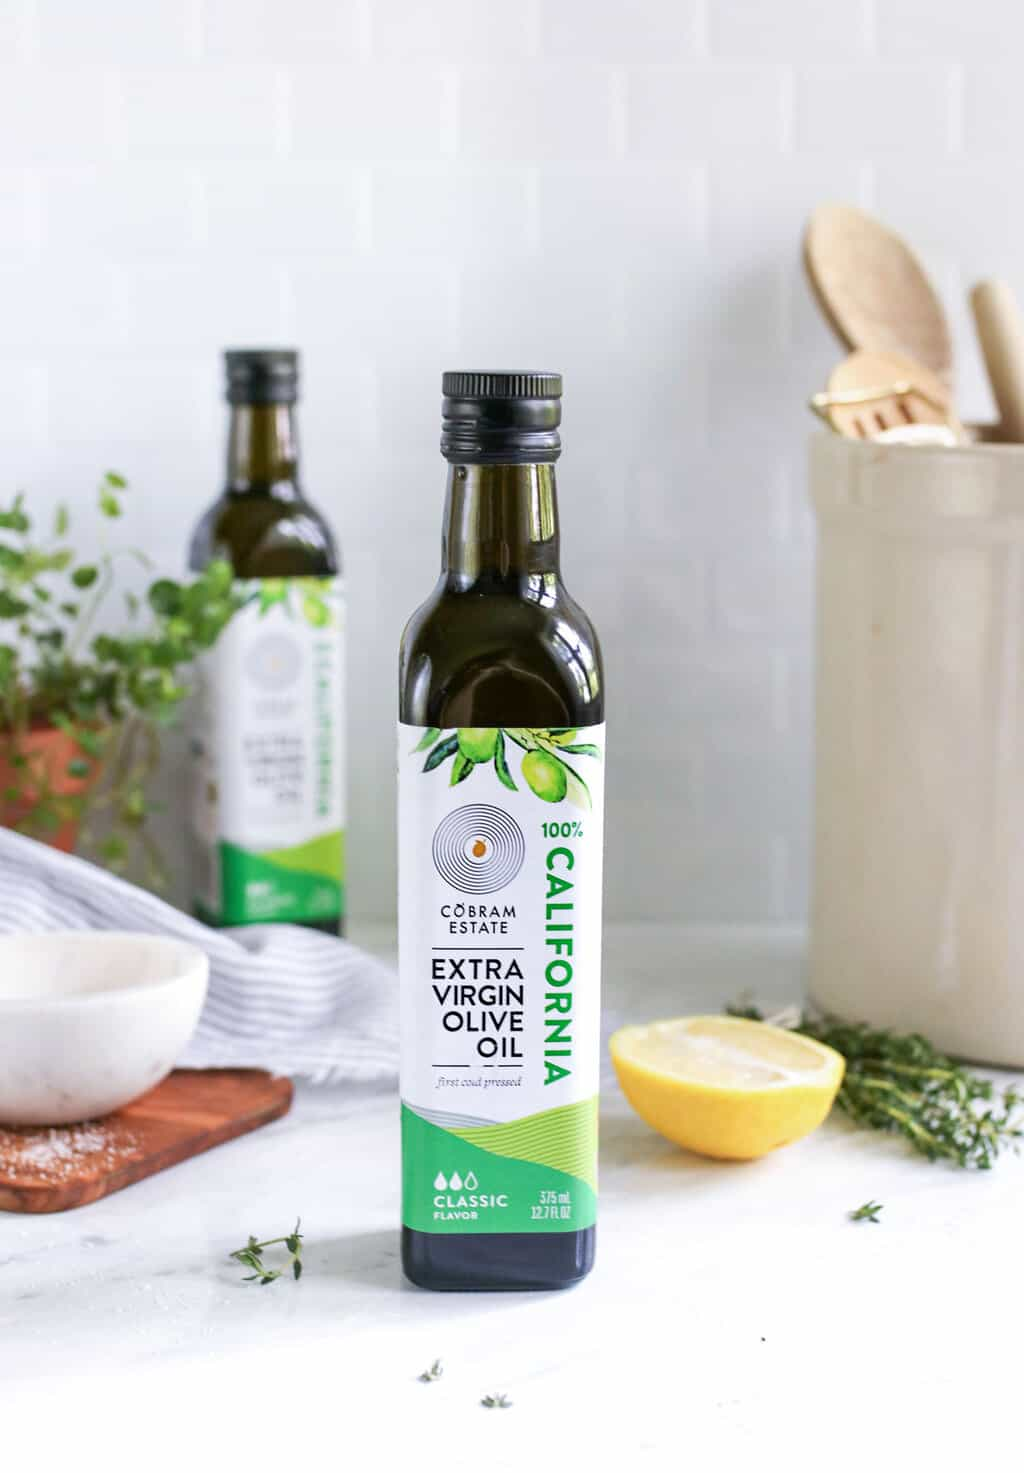 Cobram Estate California Extra Virgin Olive Oil